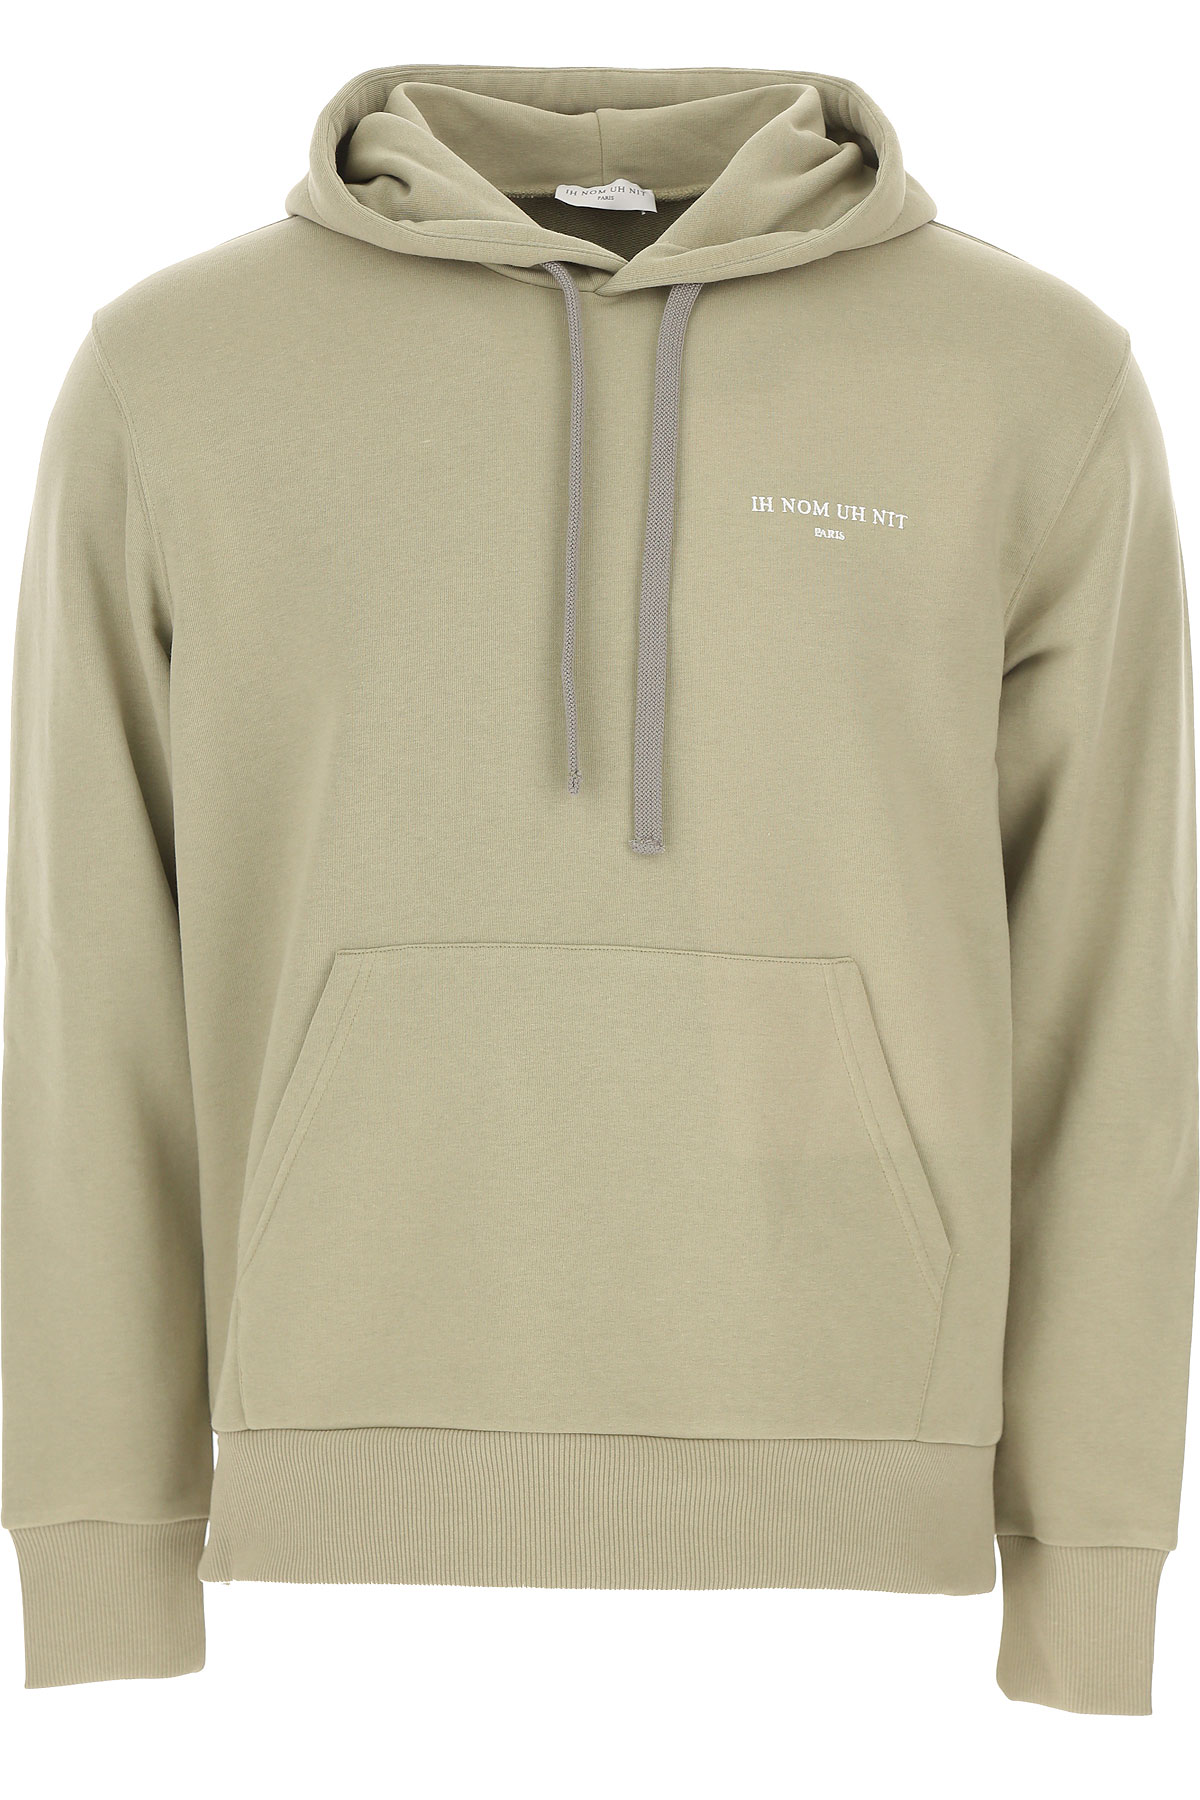 Ih Nom Uh Nit Sweatshirt for Men On Sale, Loden Green, polyester, 2019, L M S XL